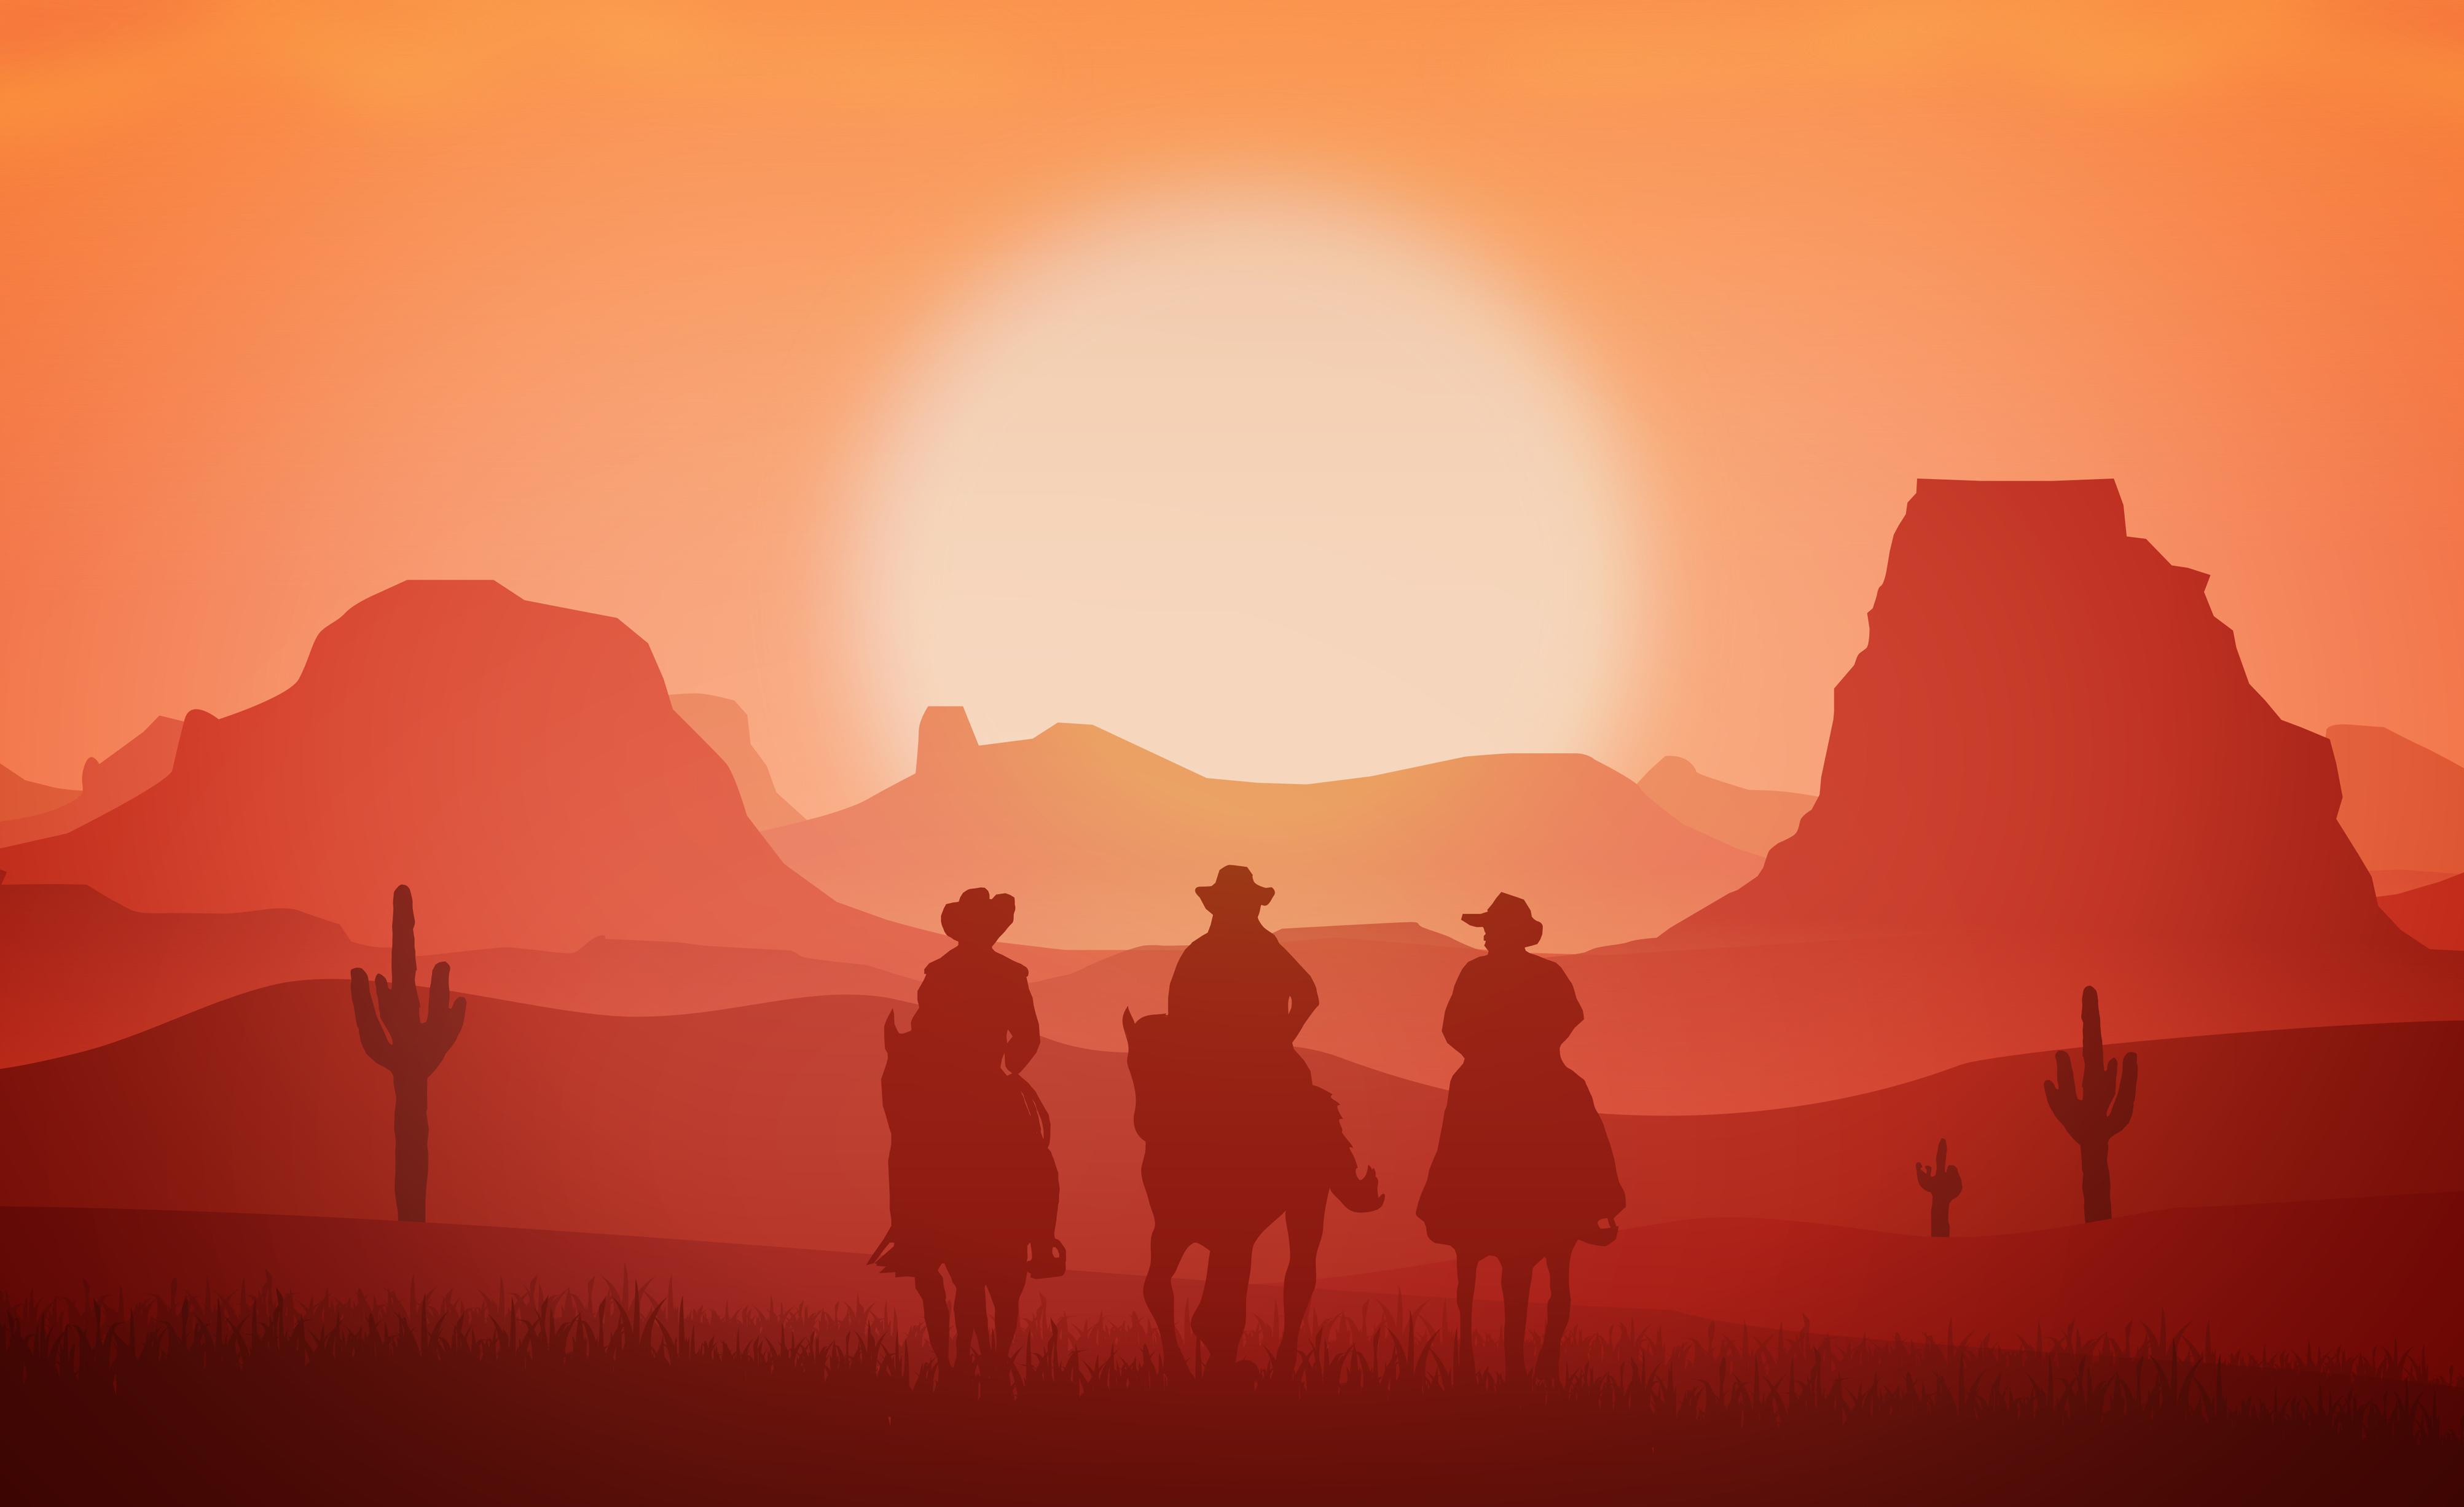 Cowboys riding horses at sunset photo